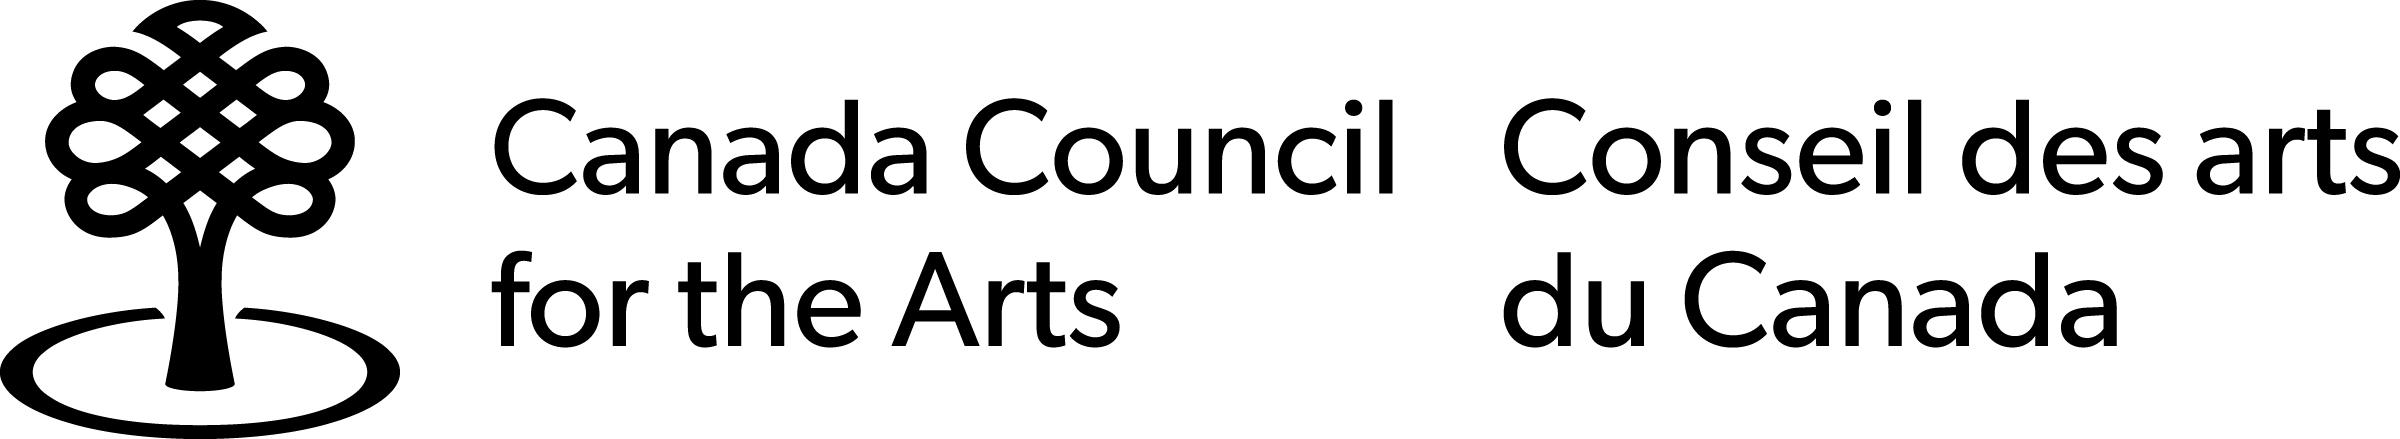 Canada Council for the Arts Conseil des arts du Canada